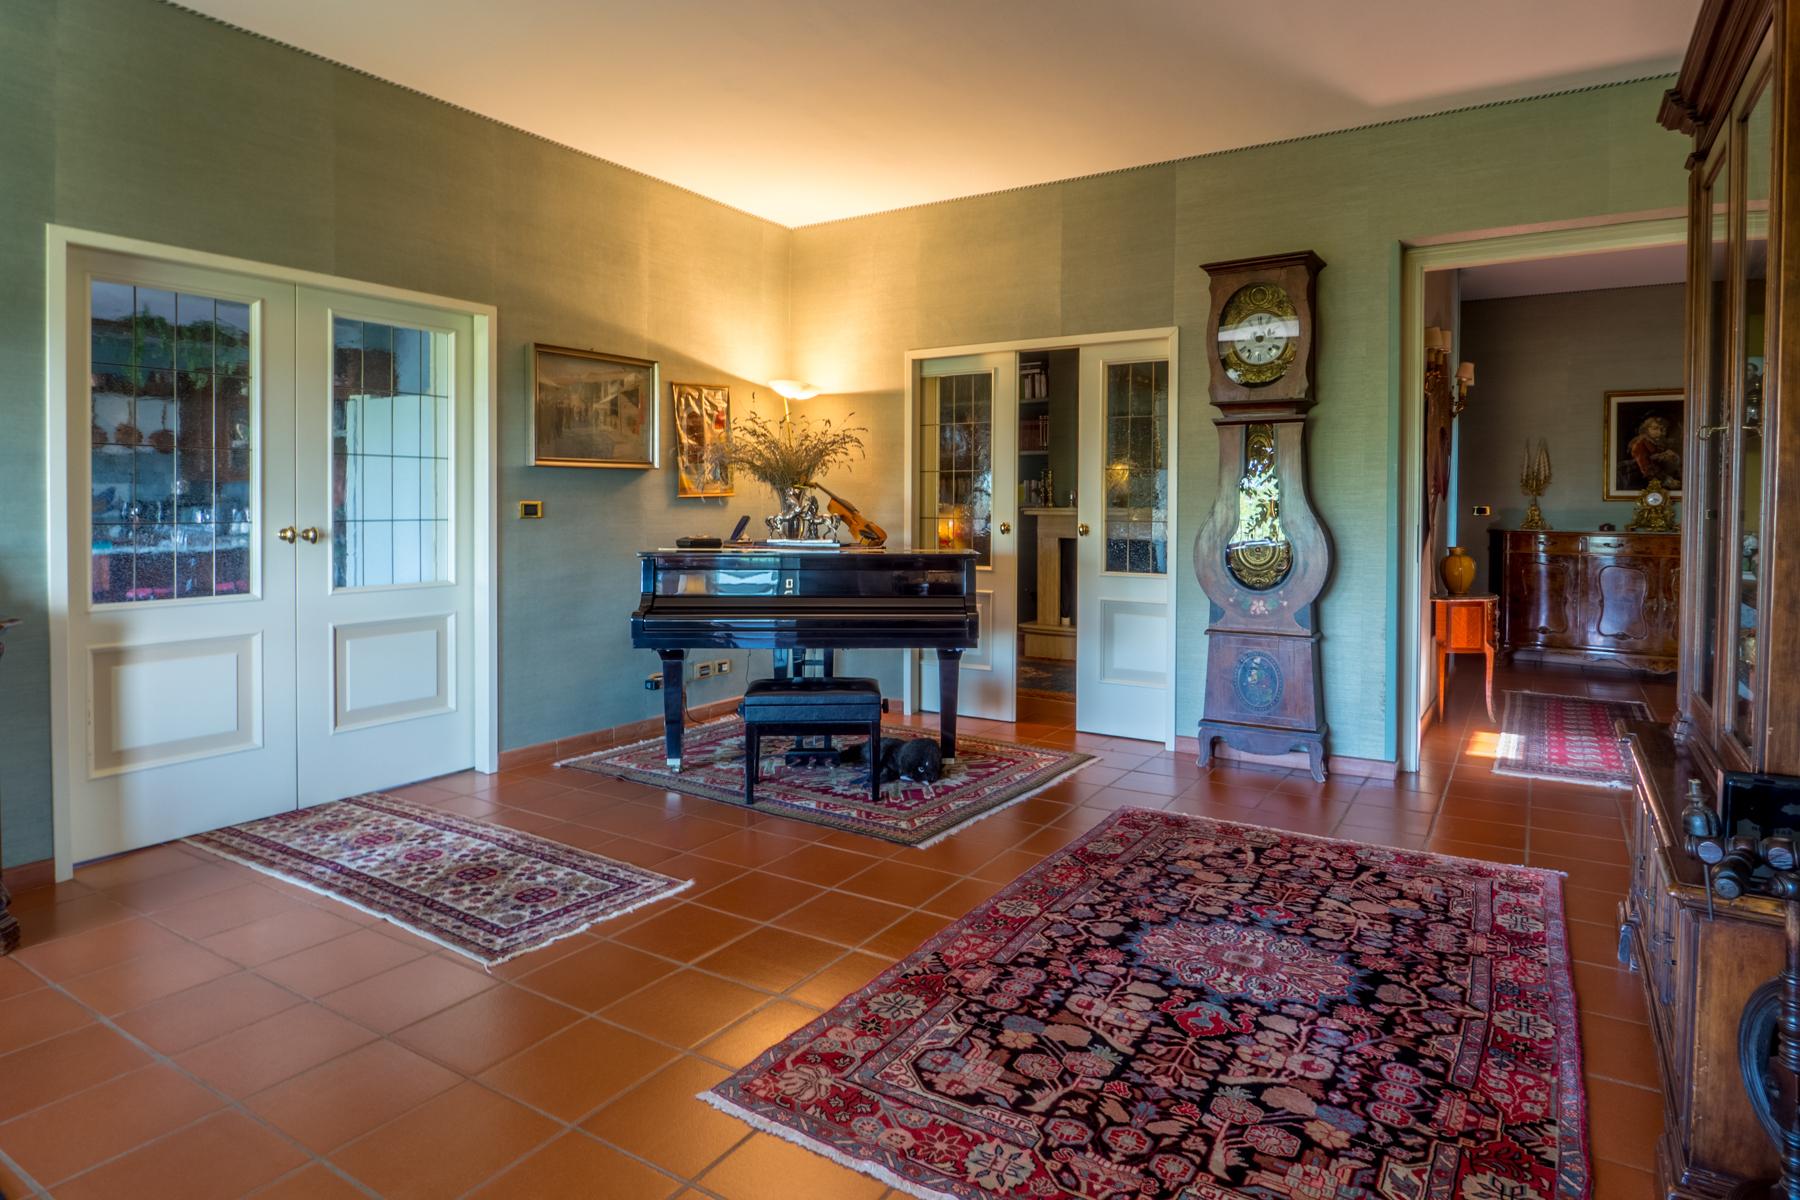 Villa in Vendita a Cantarana: 5 locali, 700 mq - Foto 14